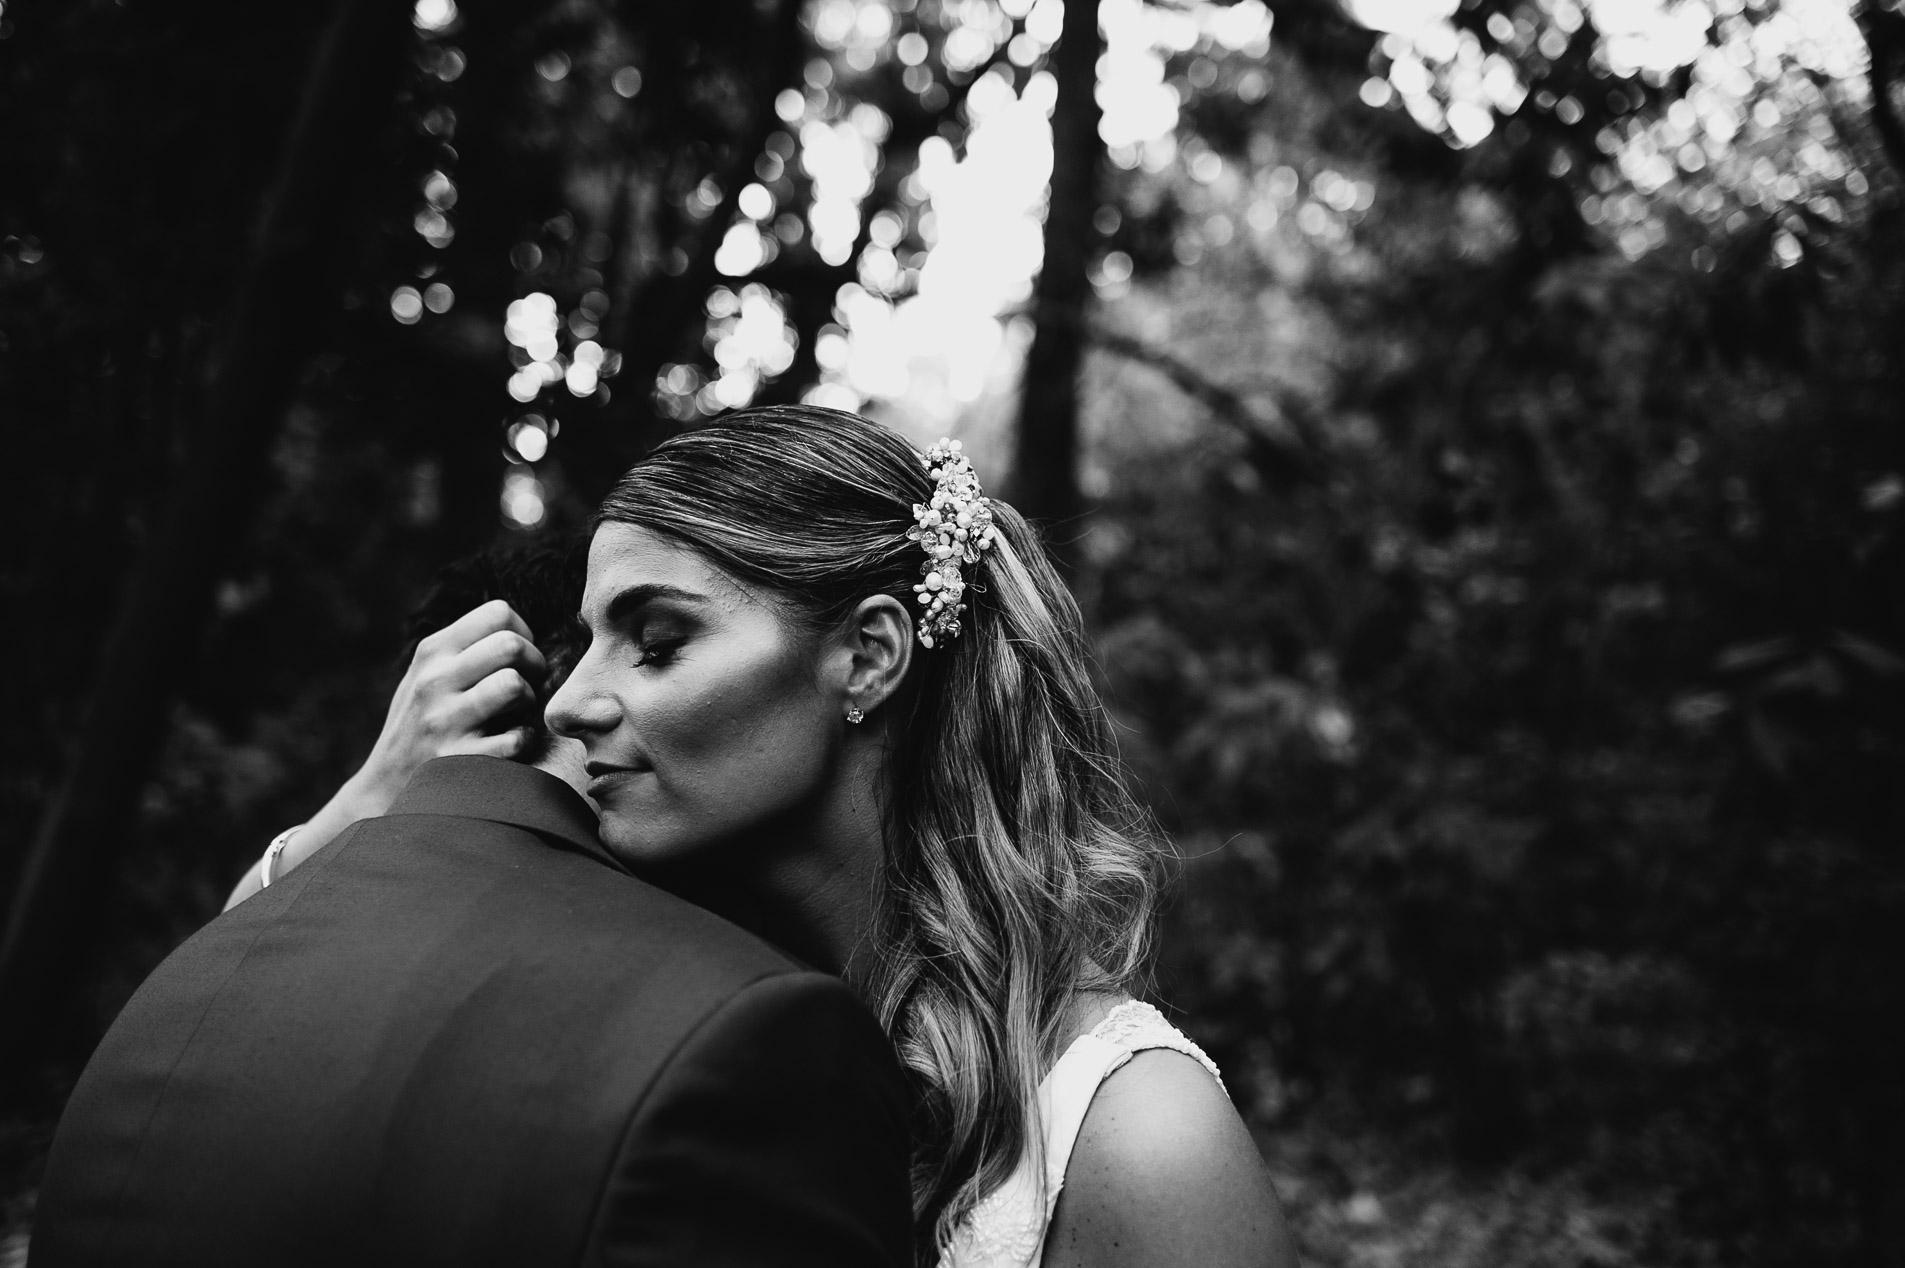 Mariana-Cristian-Fotos-Matrimonio-30